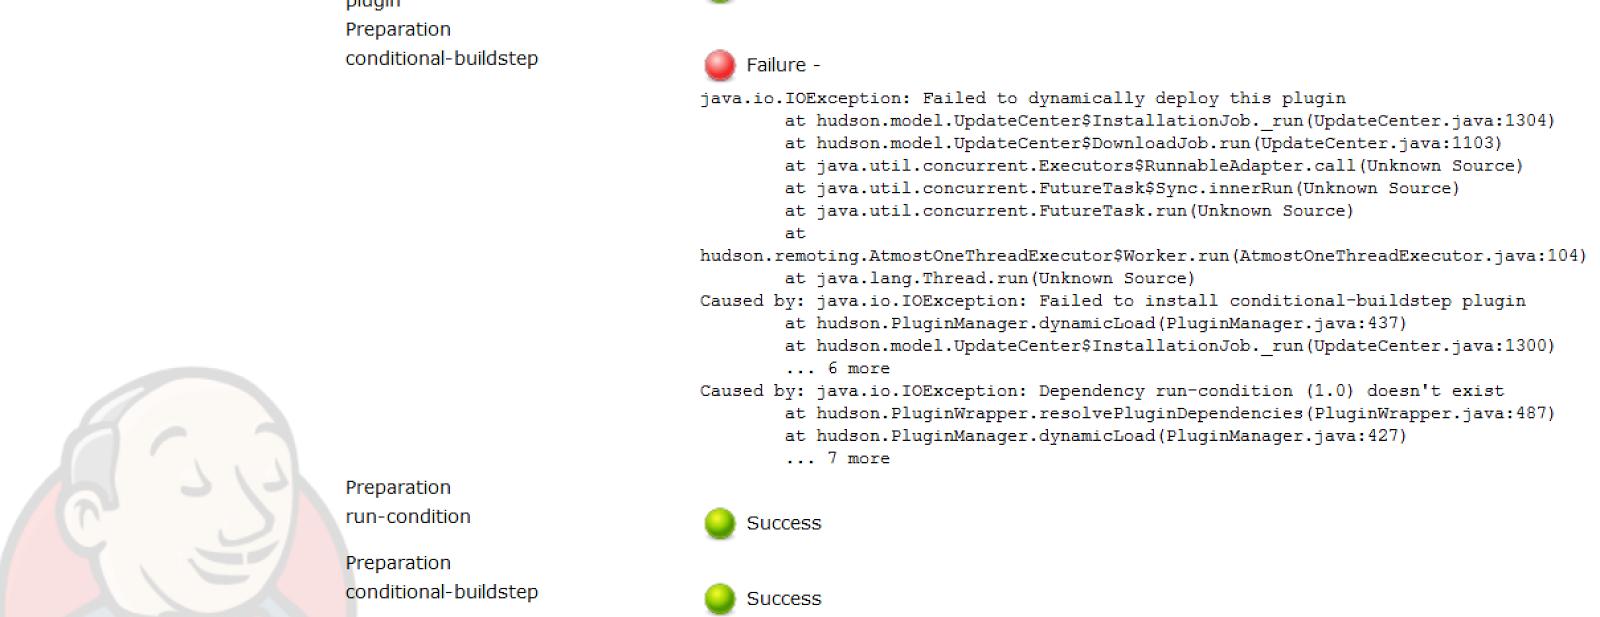 Software Antagonistic Pleiotropy: Installing Jenkins plugins